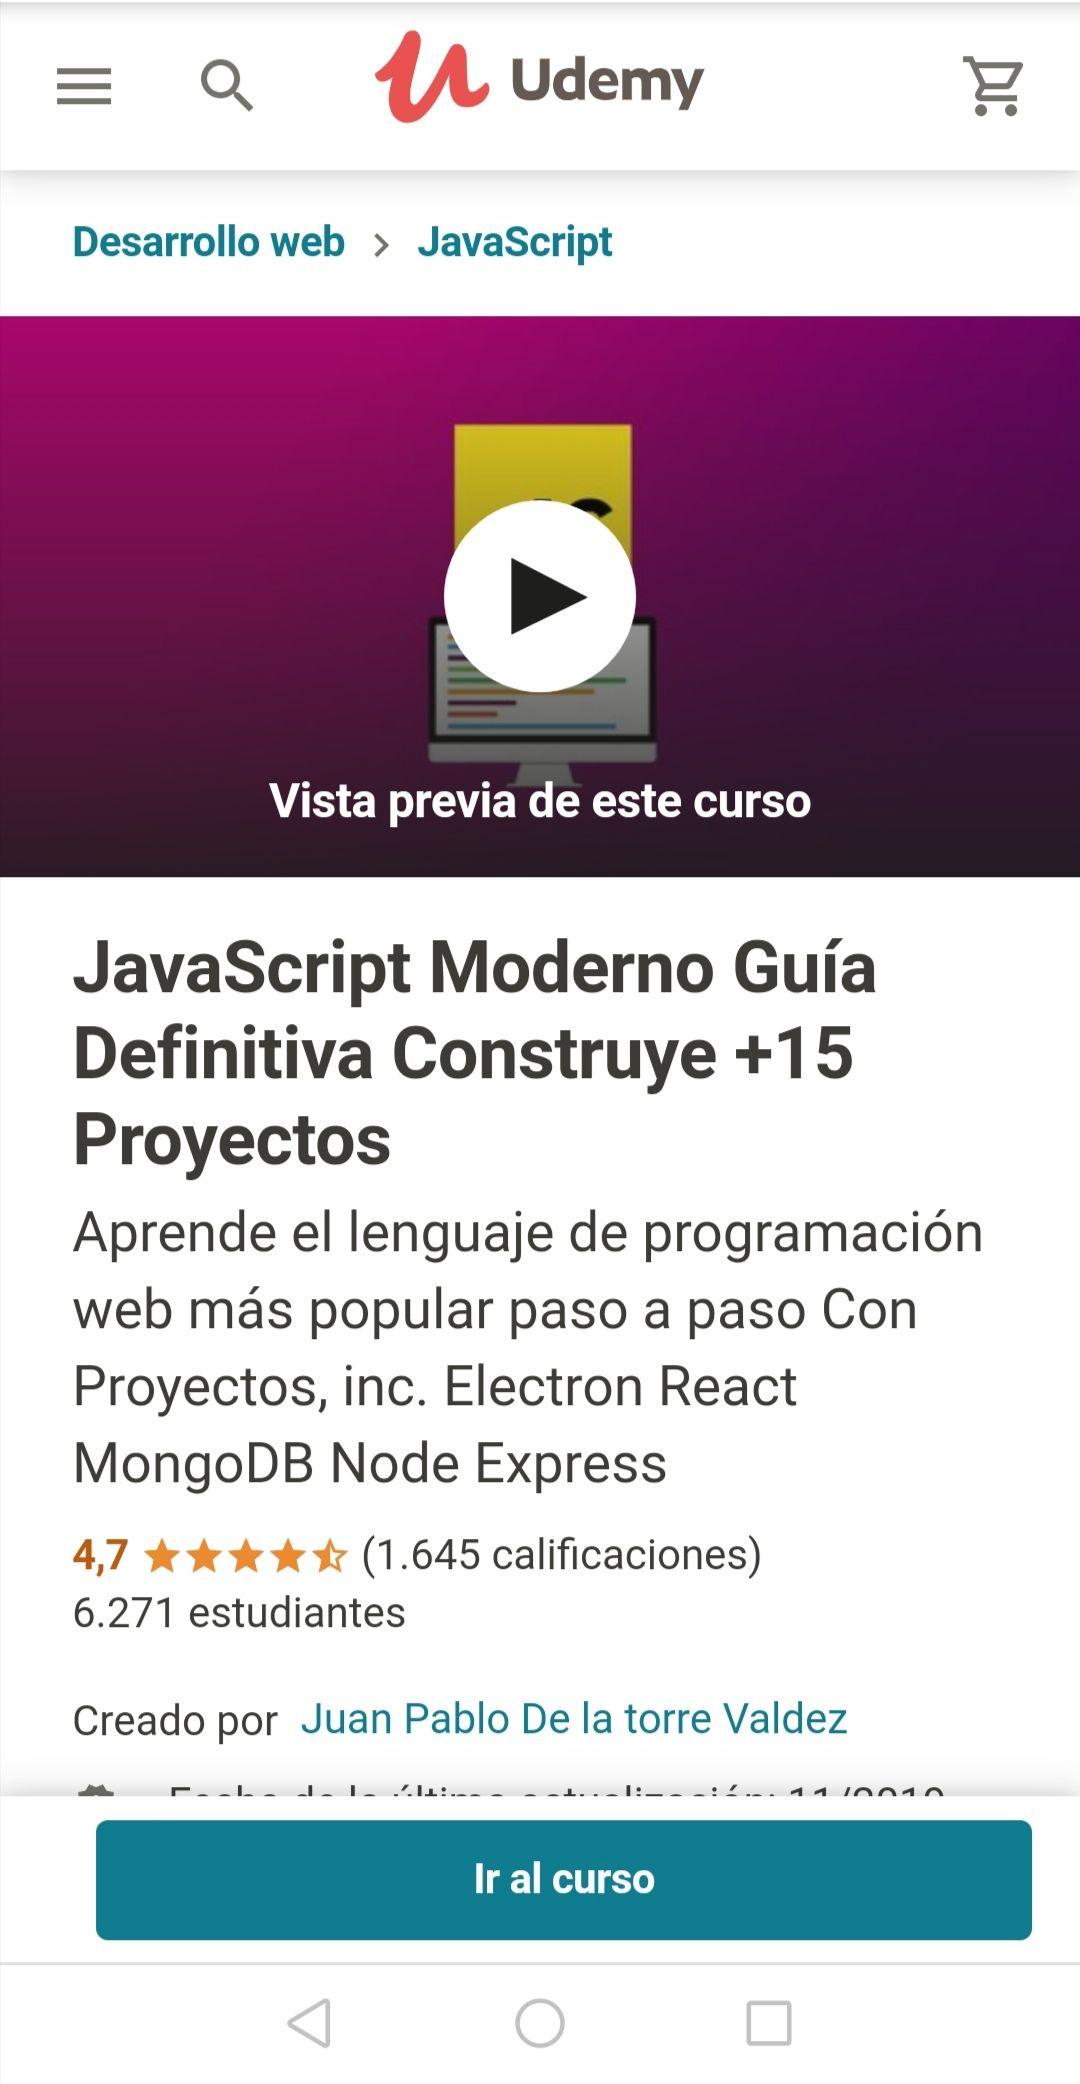 Udemy: JavaScript Moderno Guía Definitiva Construye +15 Proyectos